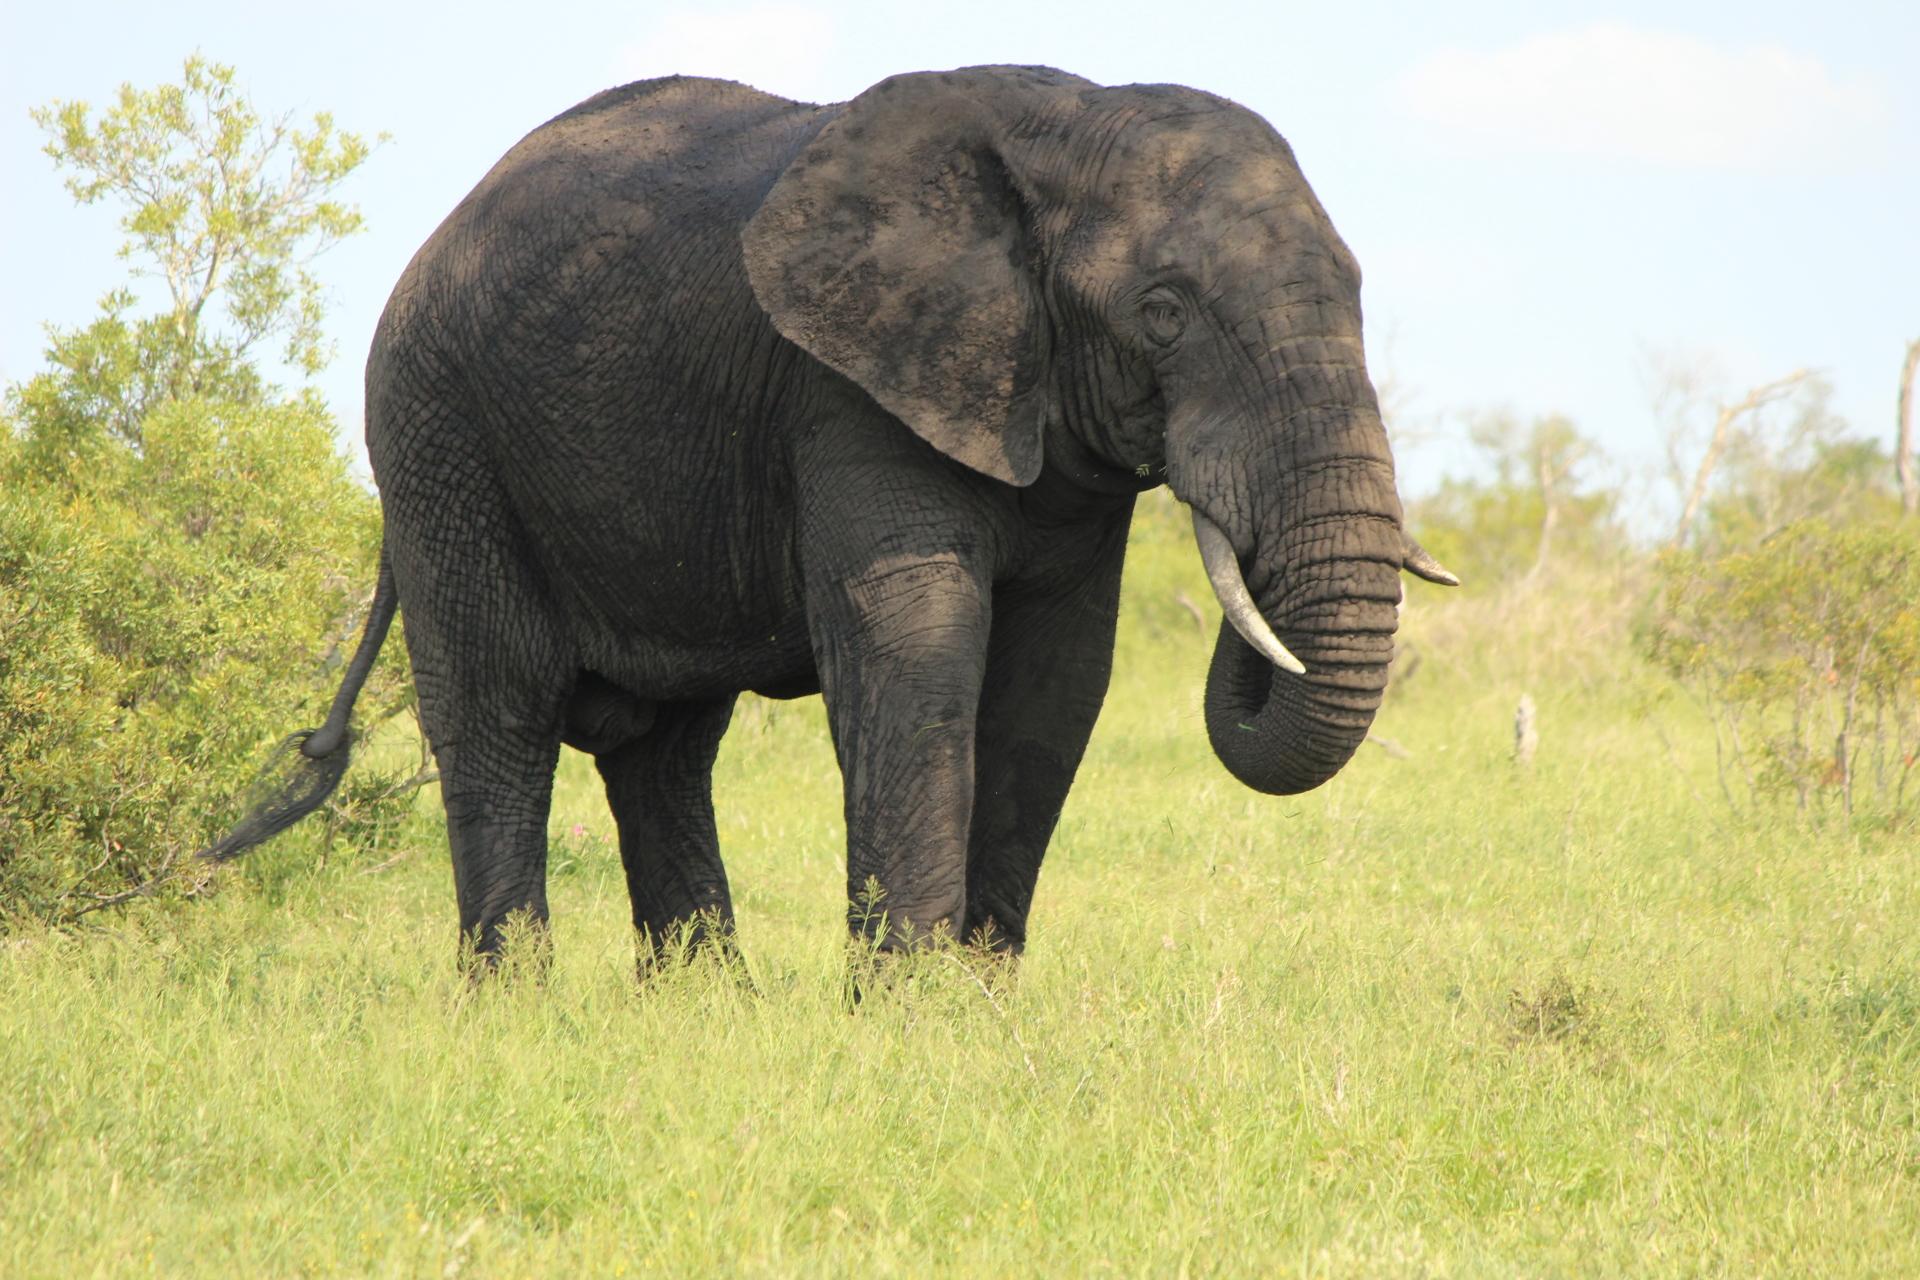 2018 South Africa Trip, Part 20: Kruger National Park, Day 2